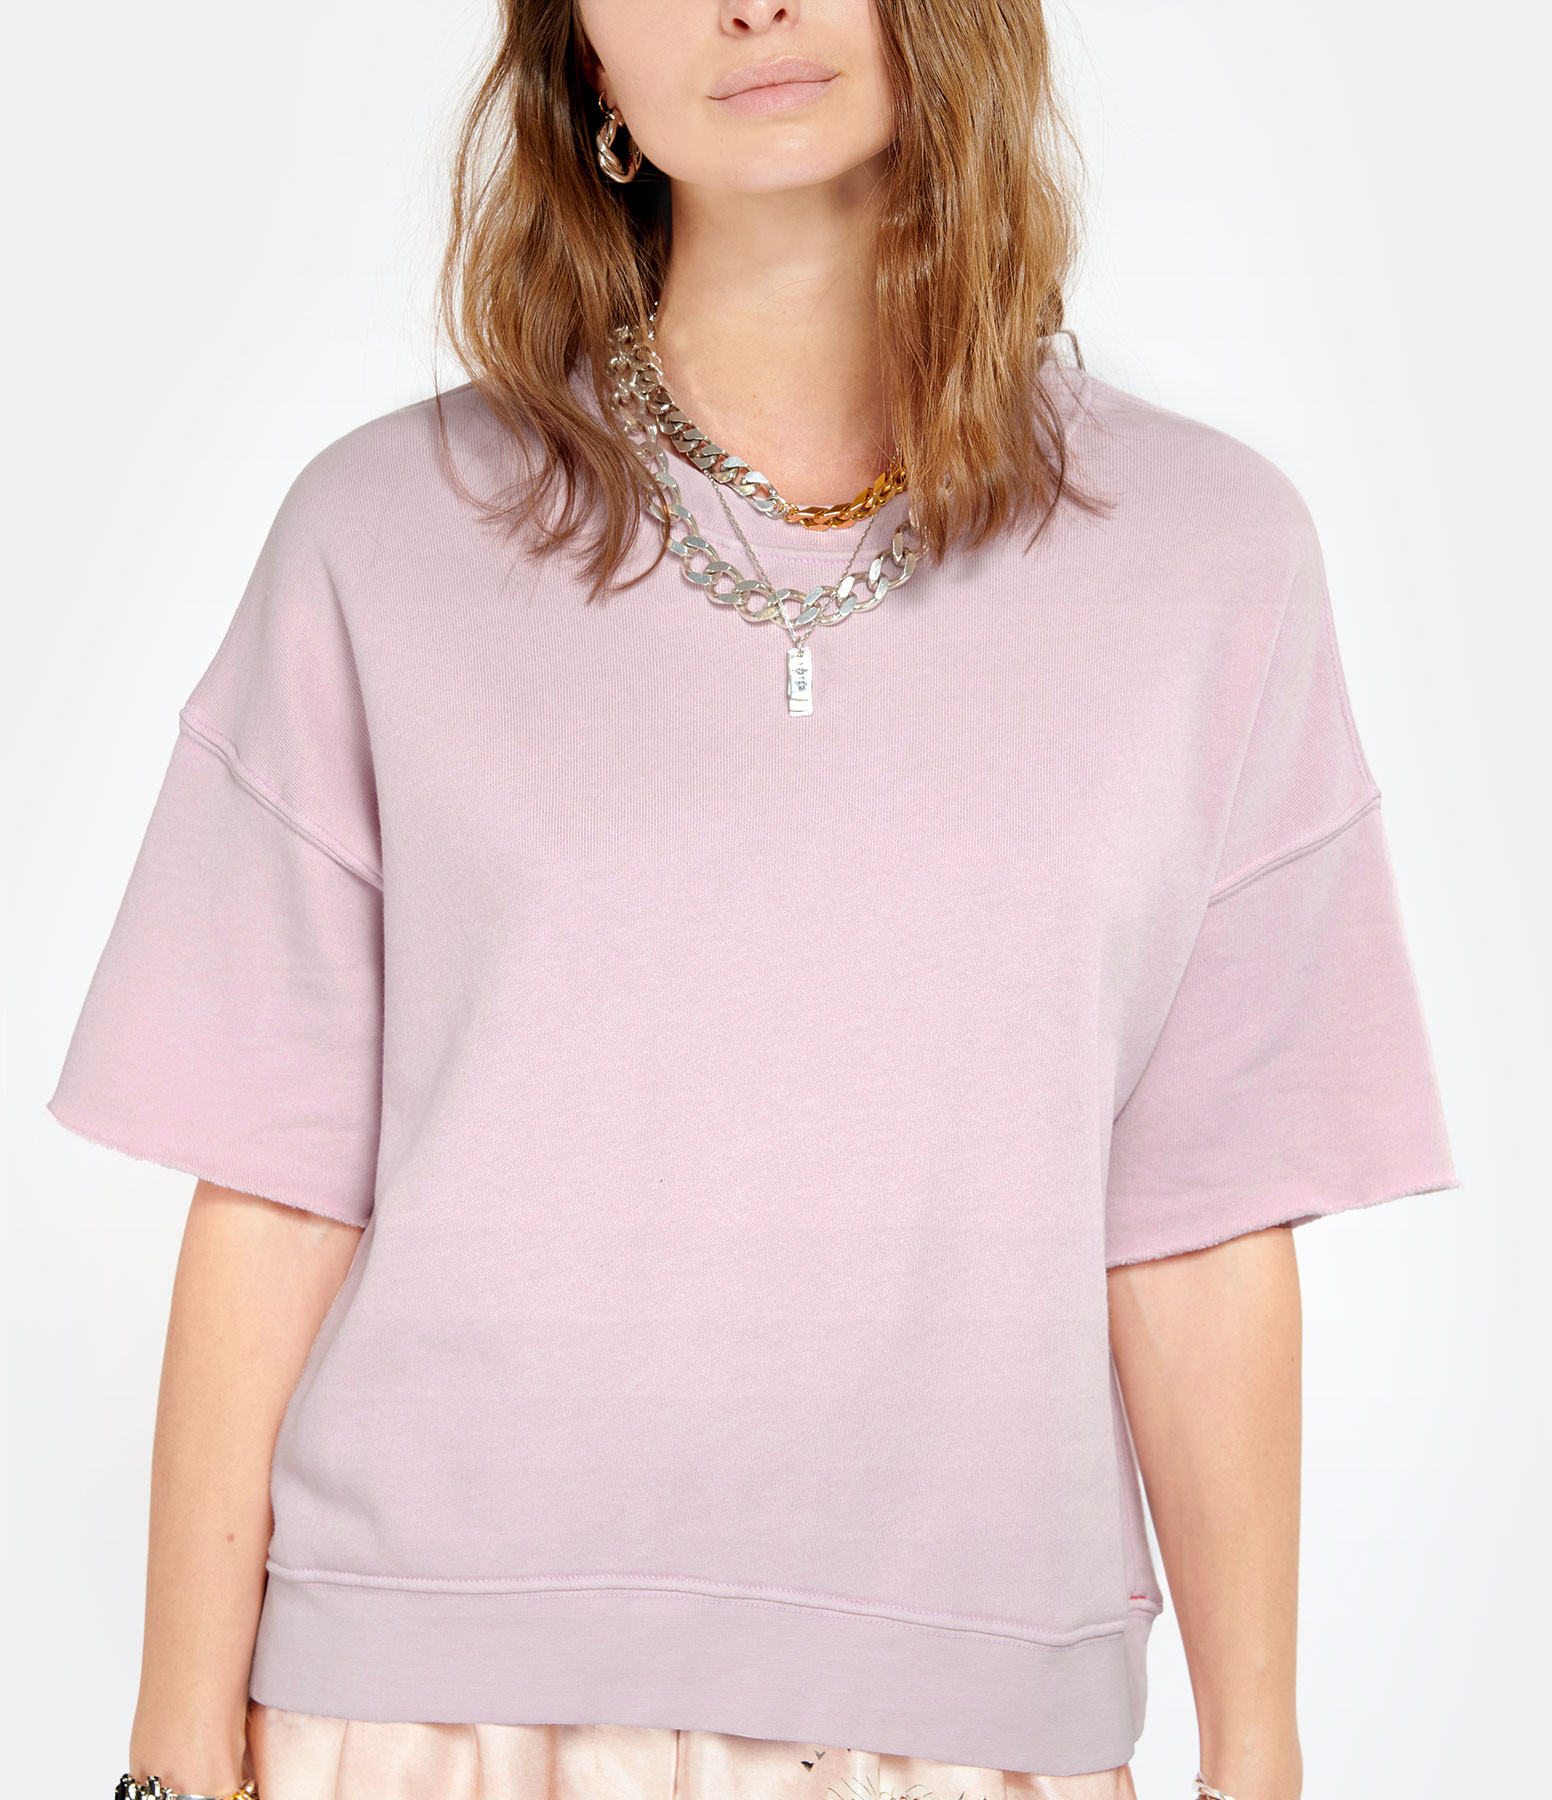 XIRENA - Tee-shirt O.G. Rose